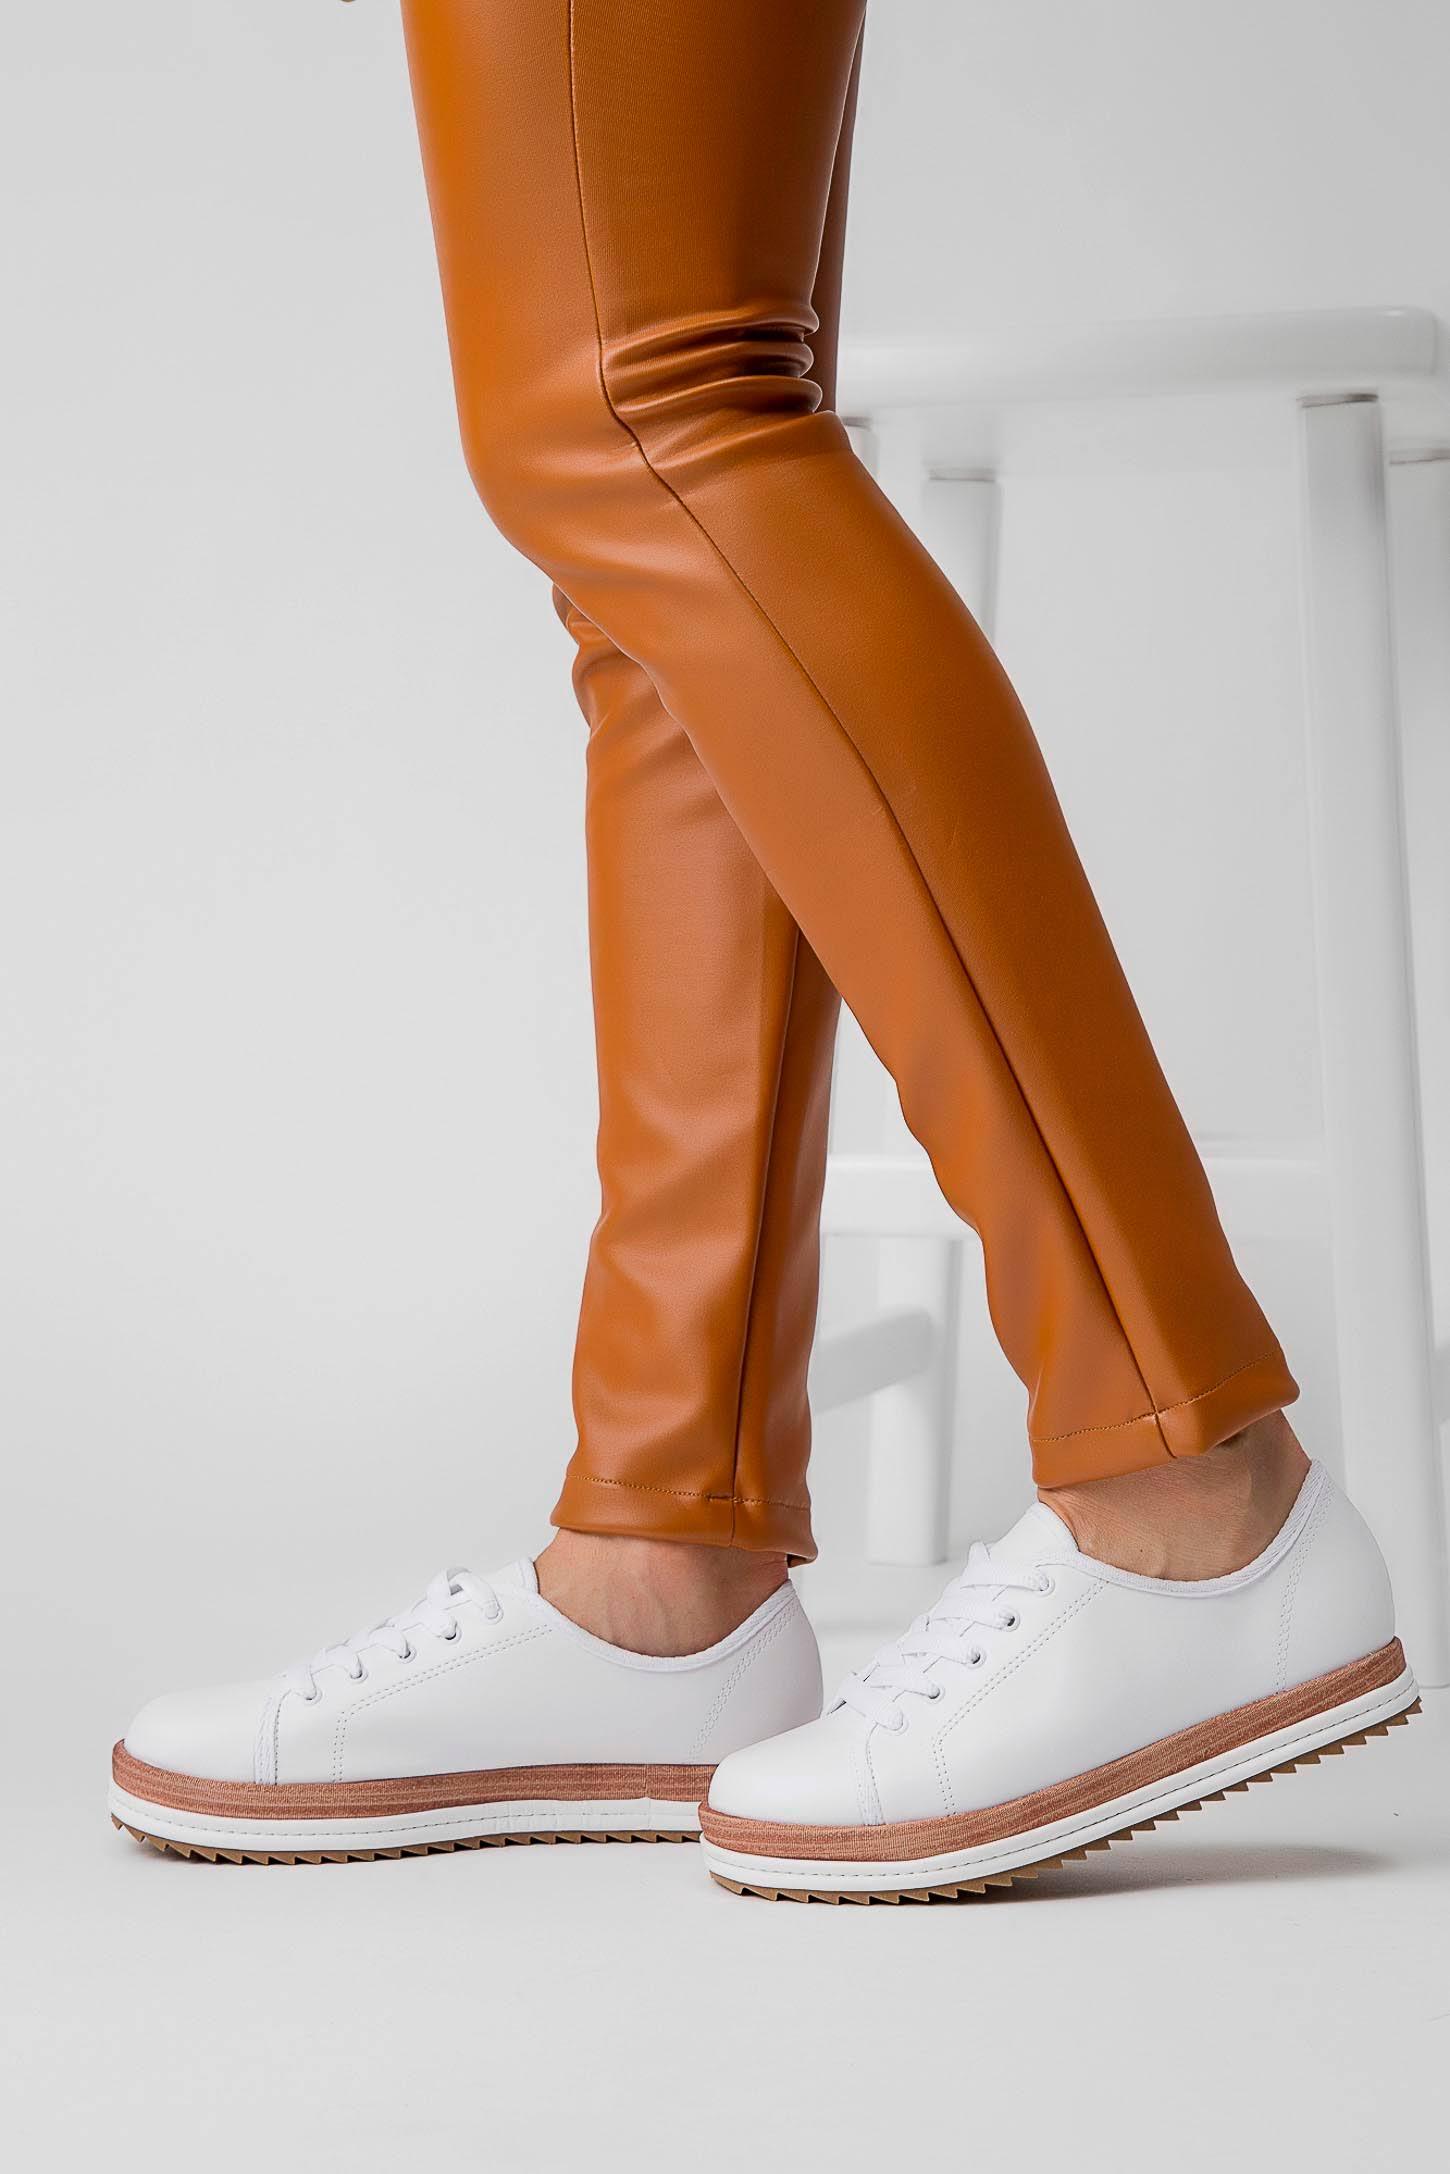 Sapato Feminino Beira Branco Oxford Cor Tratorado Na Rio z7Fvx7